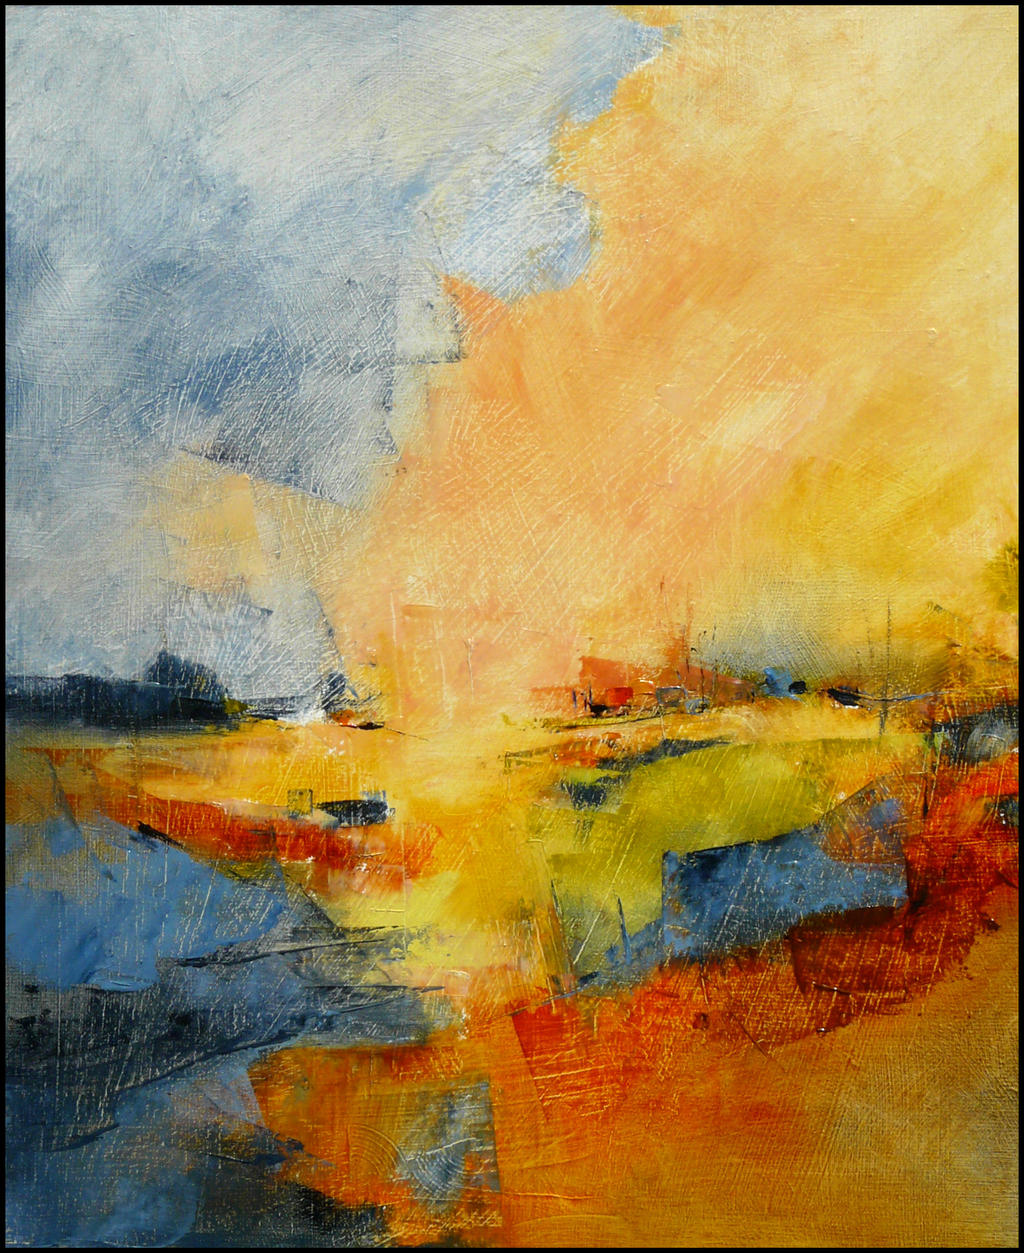 Paysage 46x55 by Malahicha